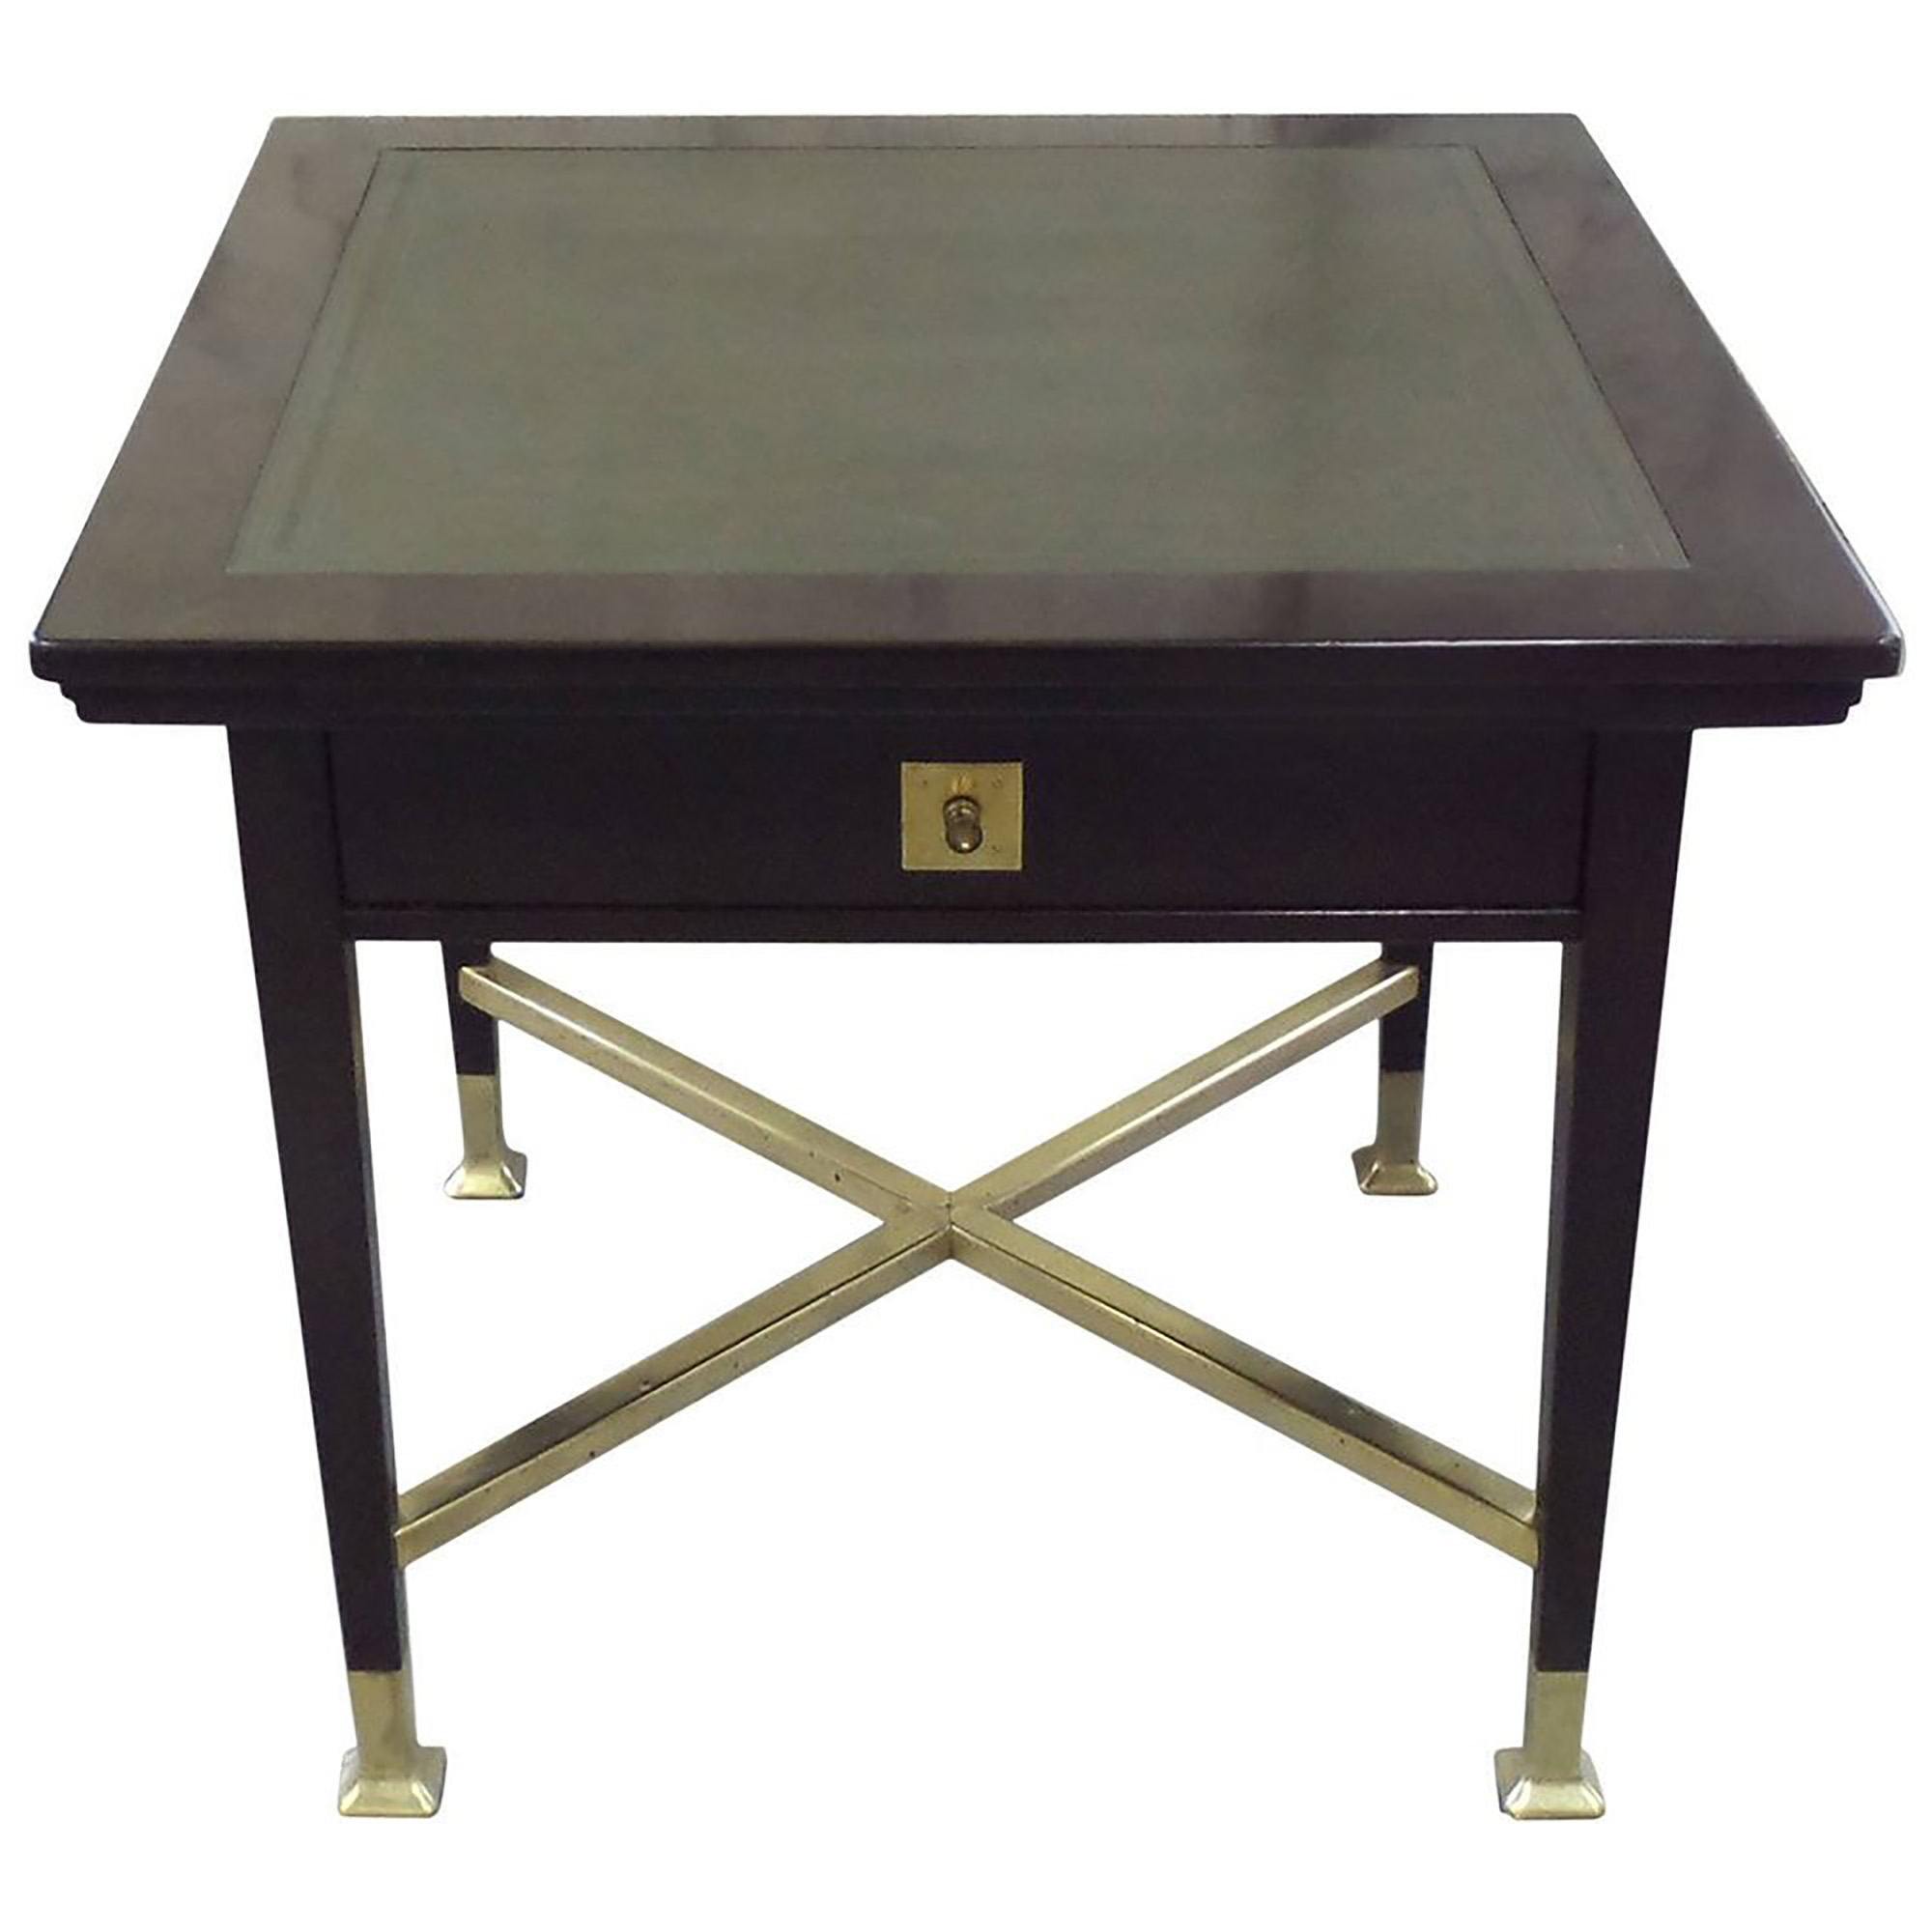 L7414-Austrian-Secessionist-card-table-four-synchronized-mechanical-corner-trays-Victoria-Son-victoriaandson.com-furniture-custom-antiques-interior-decor.jpg